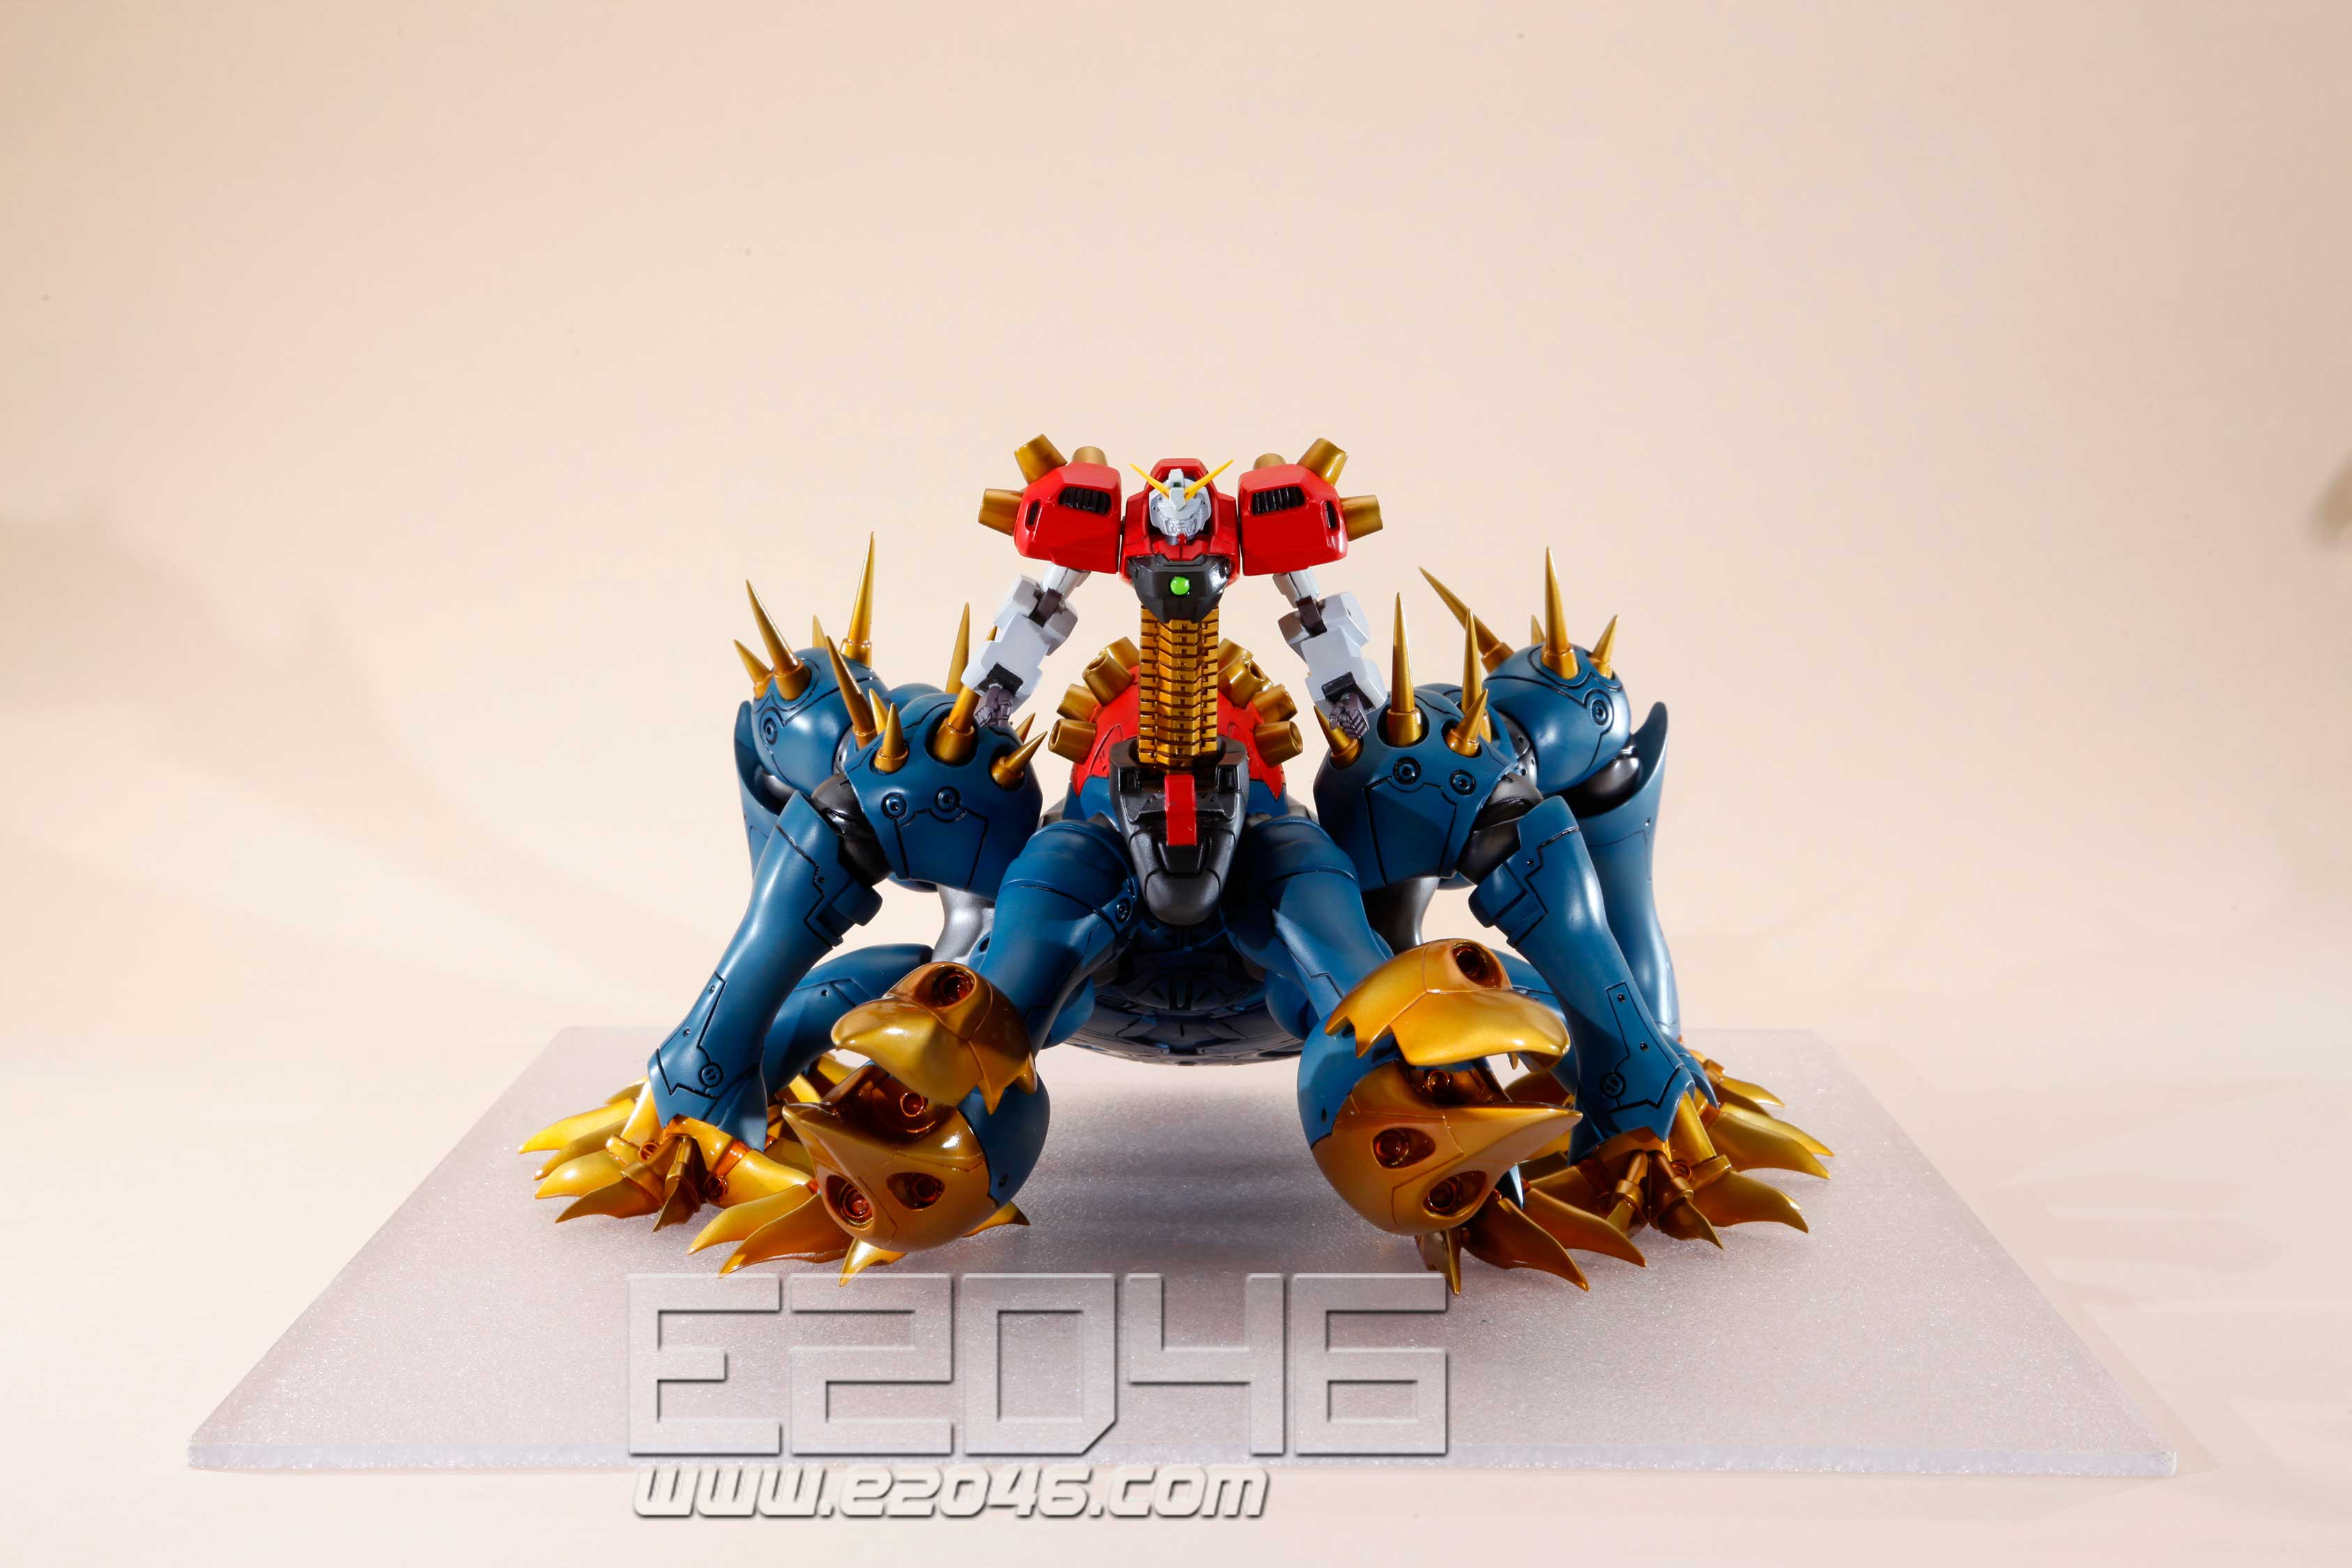 JDG-009X Devil Gundam (Pre-painted)